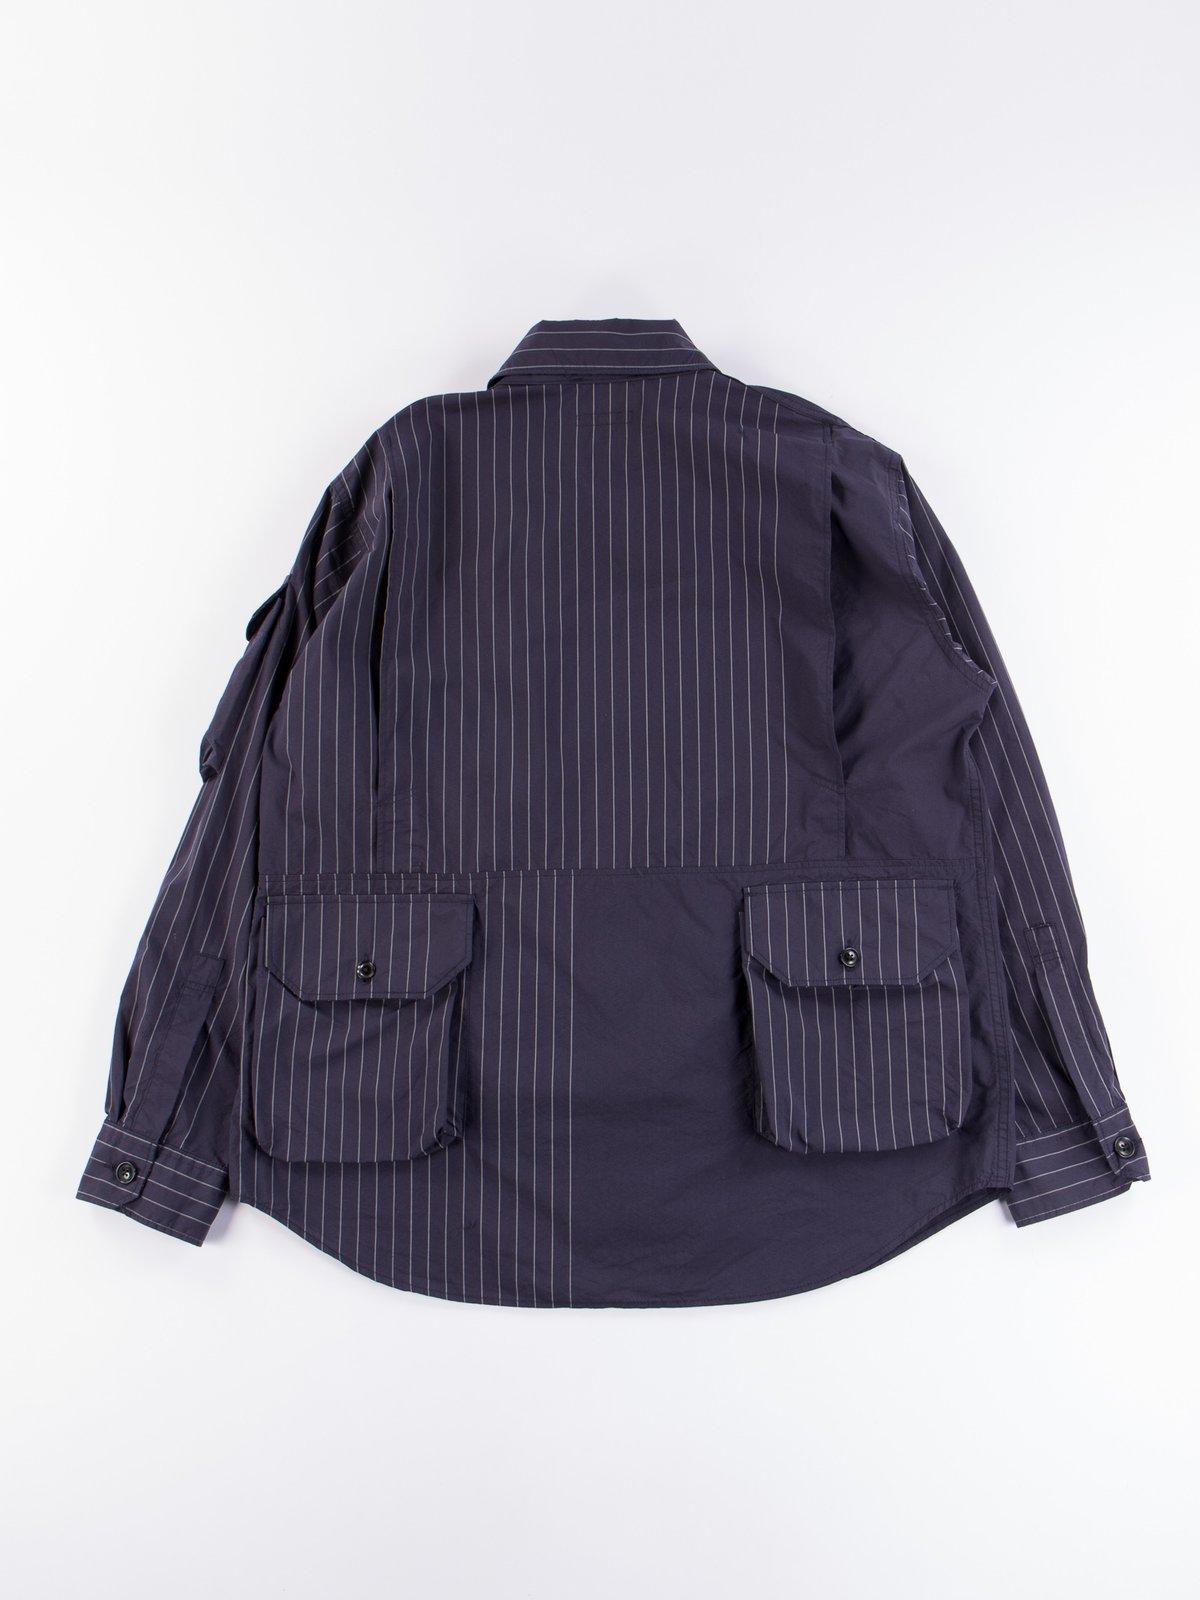 Dark Navy Nyco Gangster Stripe Explorer Shirt Jacket - Image 7